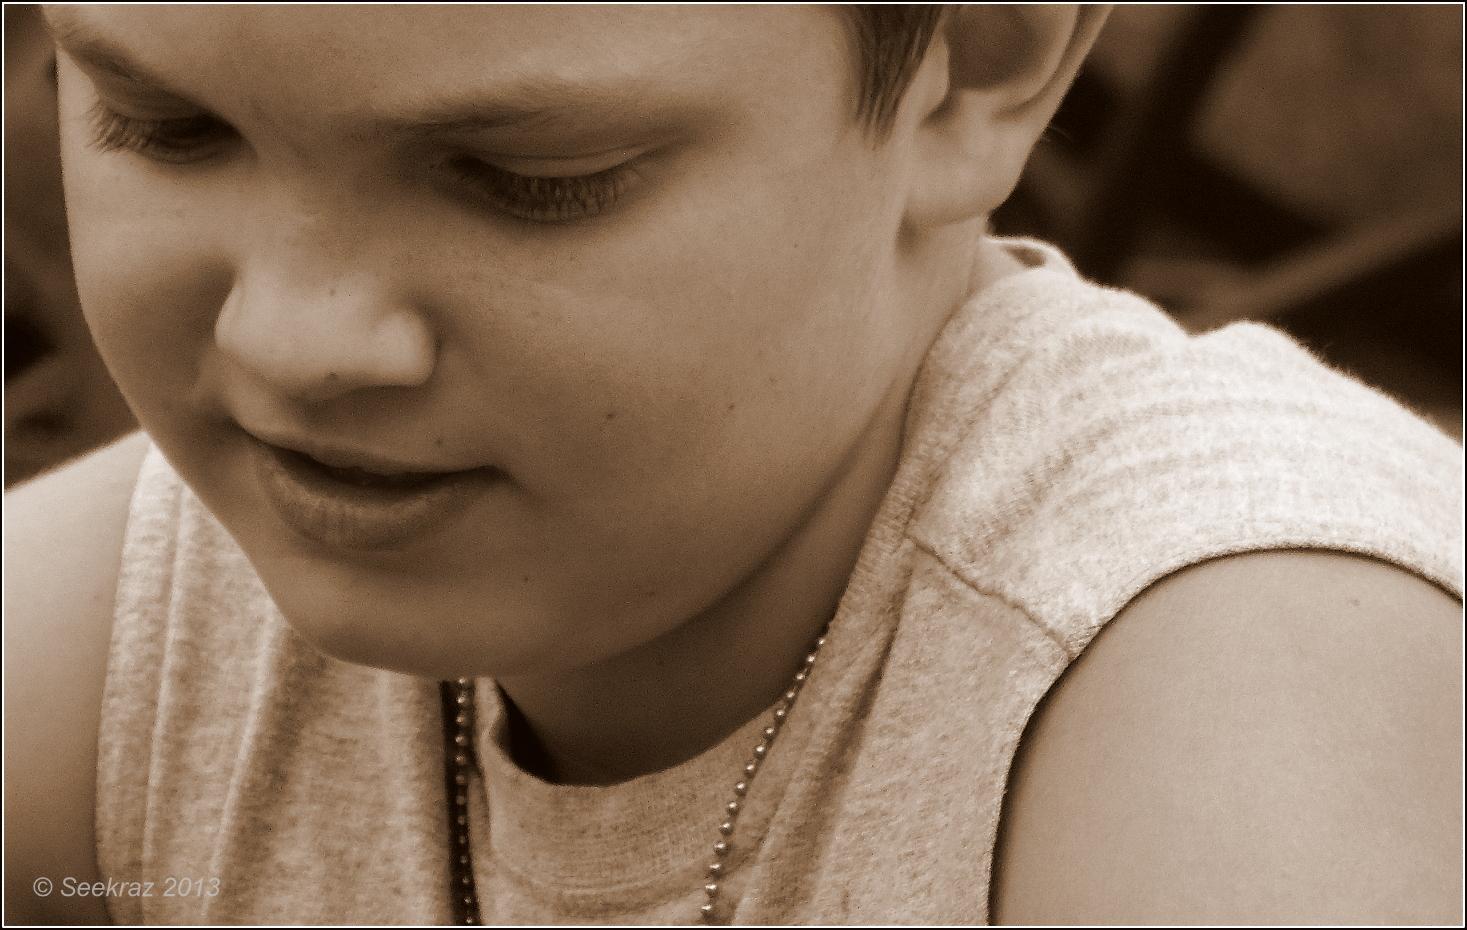 Boy in sepia